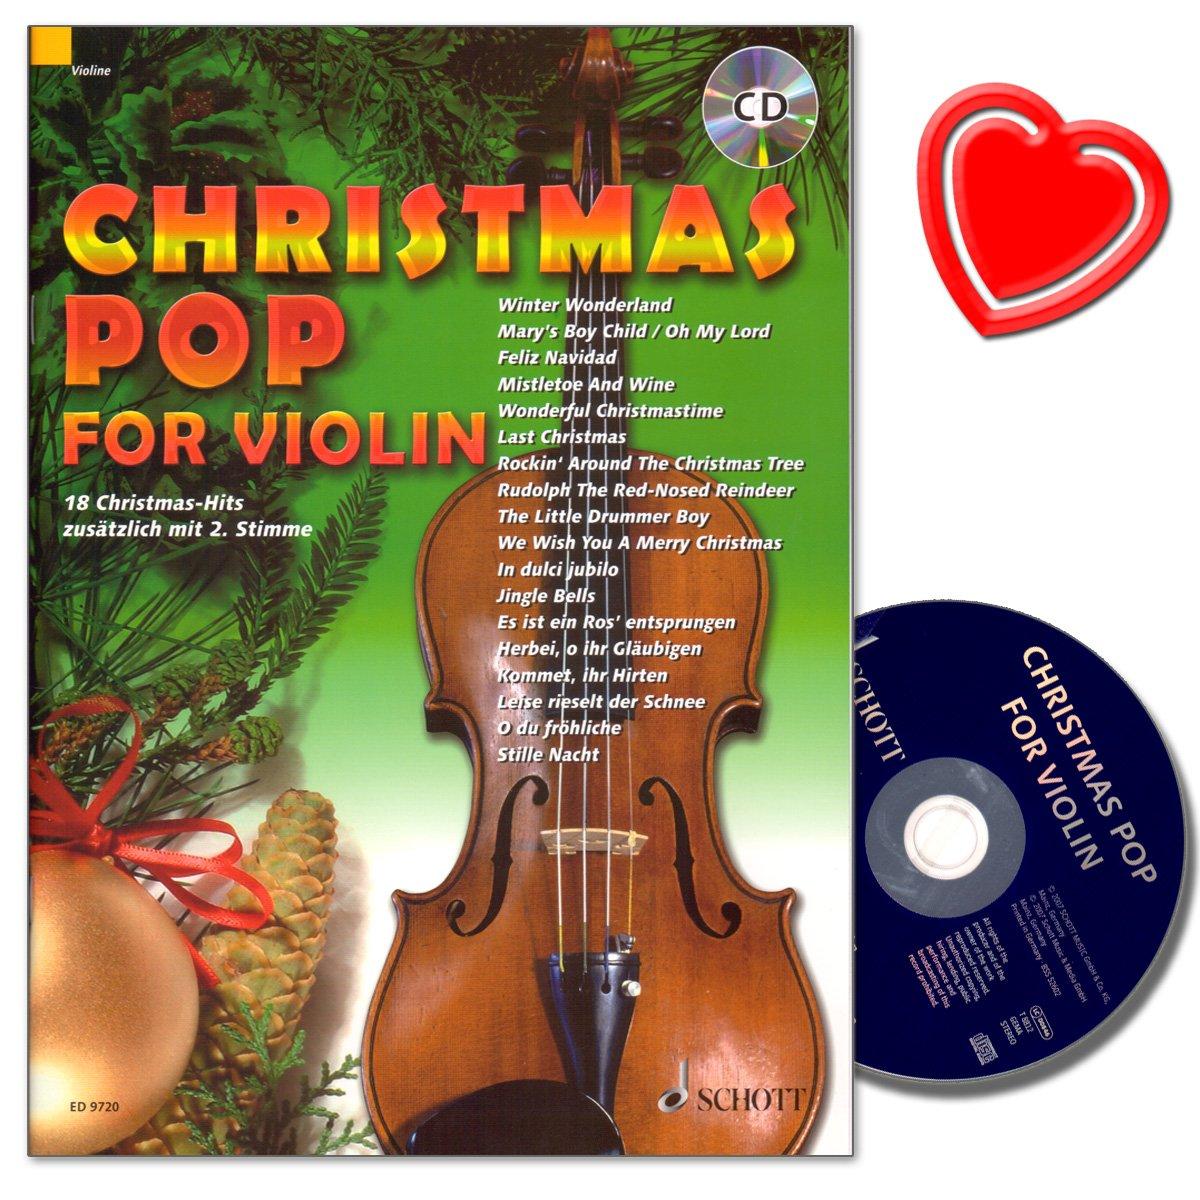 Christmas Pop for Violin: 18 Christmas-Hits für 1-2 Violine mit CD ...